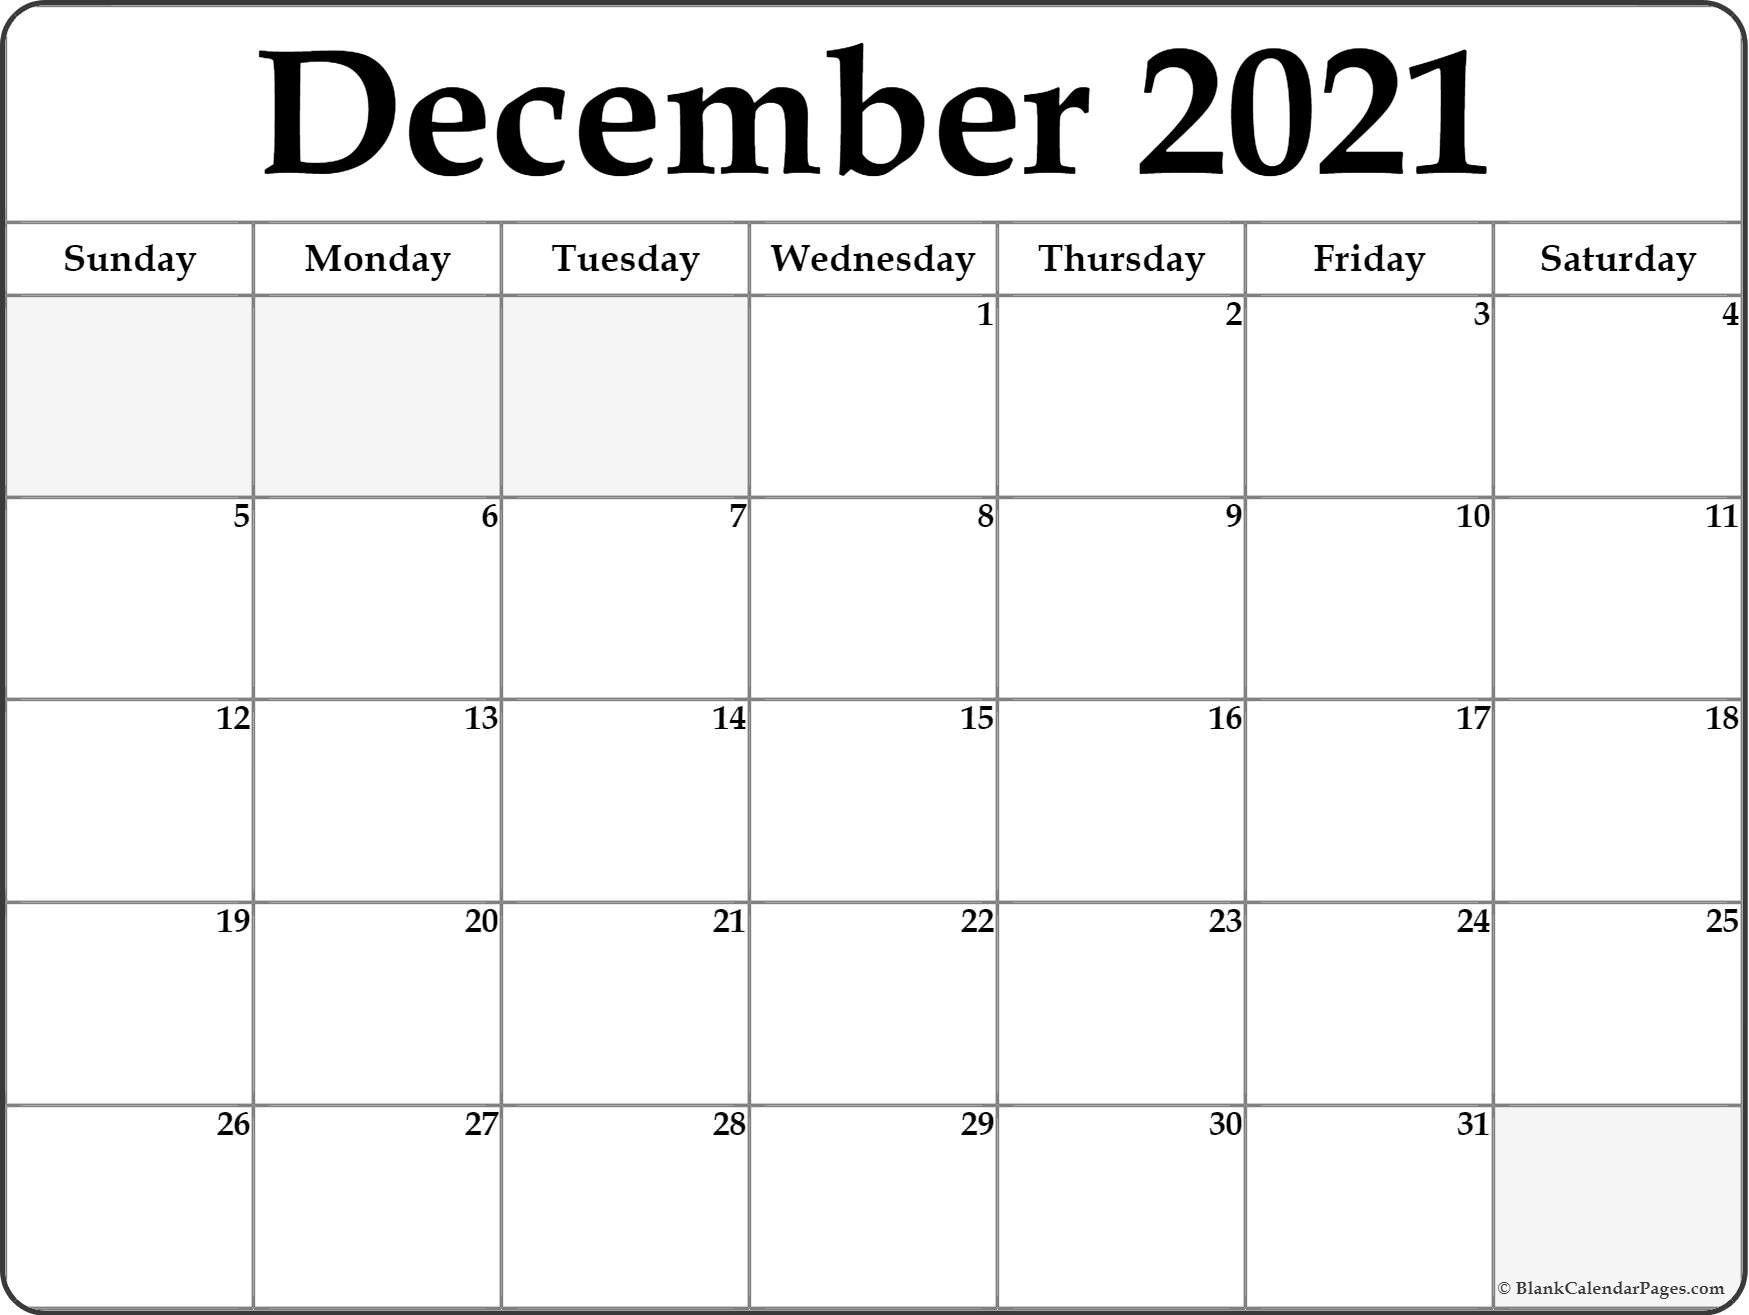 December 2021 Blank Calendar Templates December 2021 Blank in Empty Calendar Printable